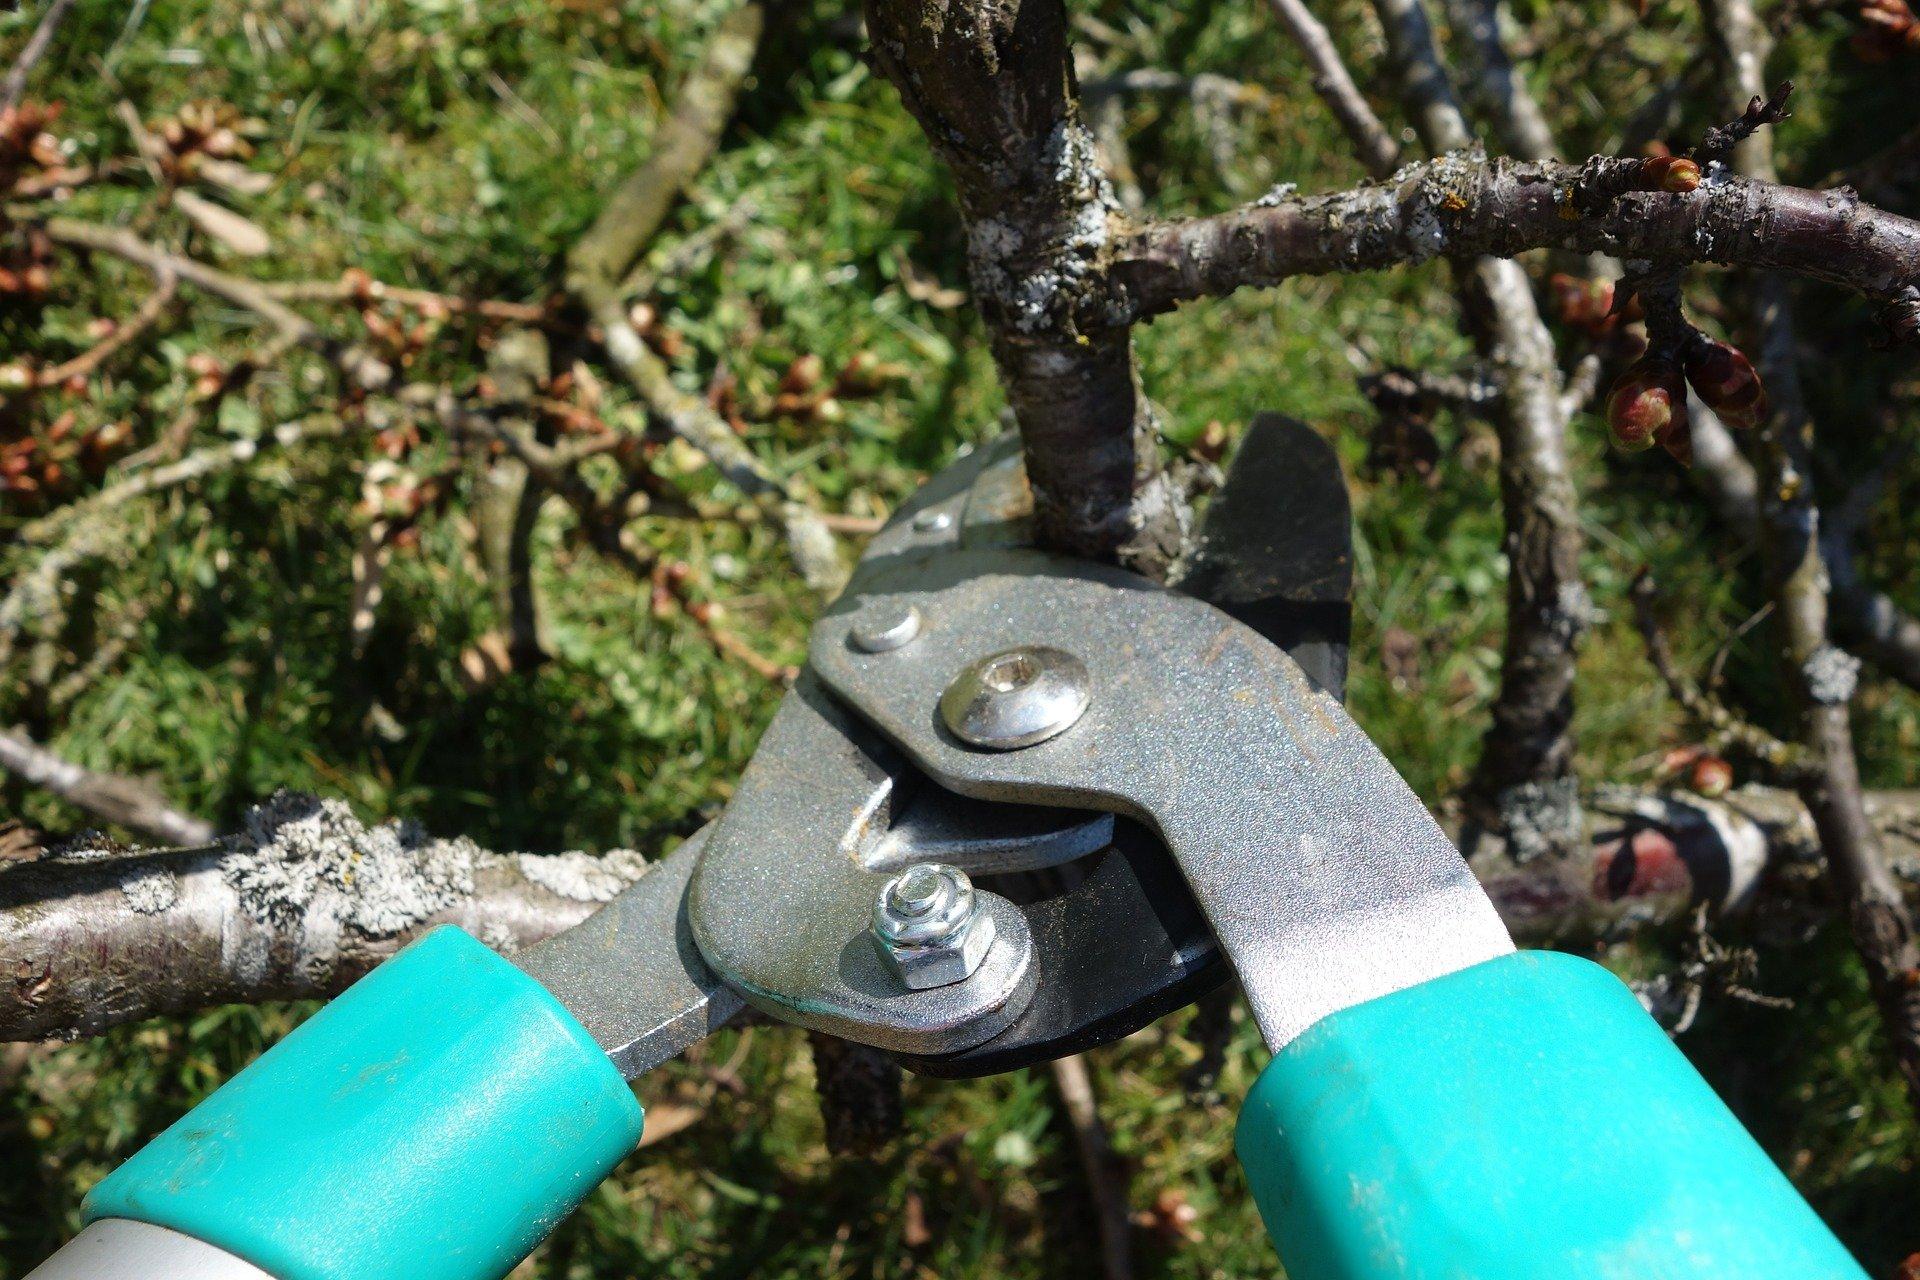 pruning-shears-535350-1920.jpg